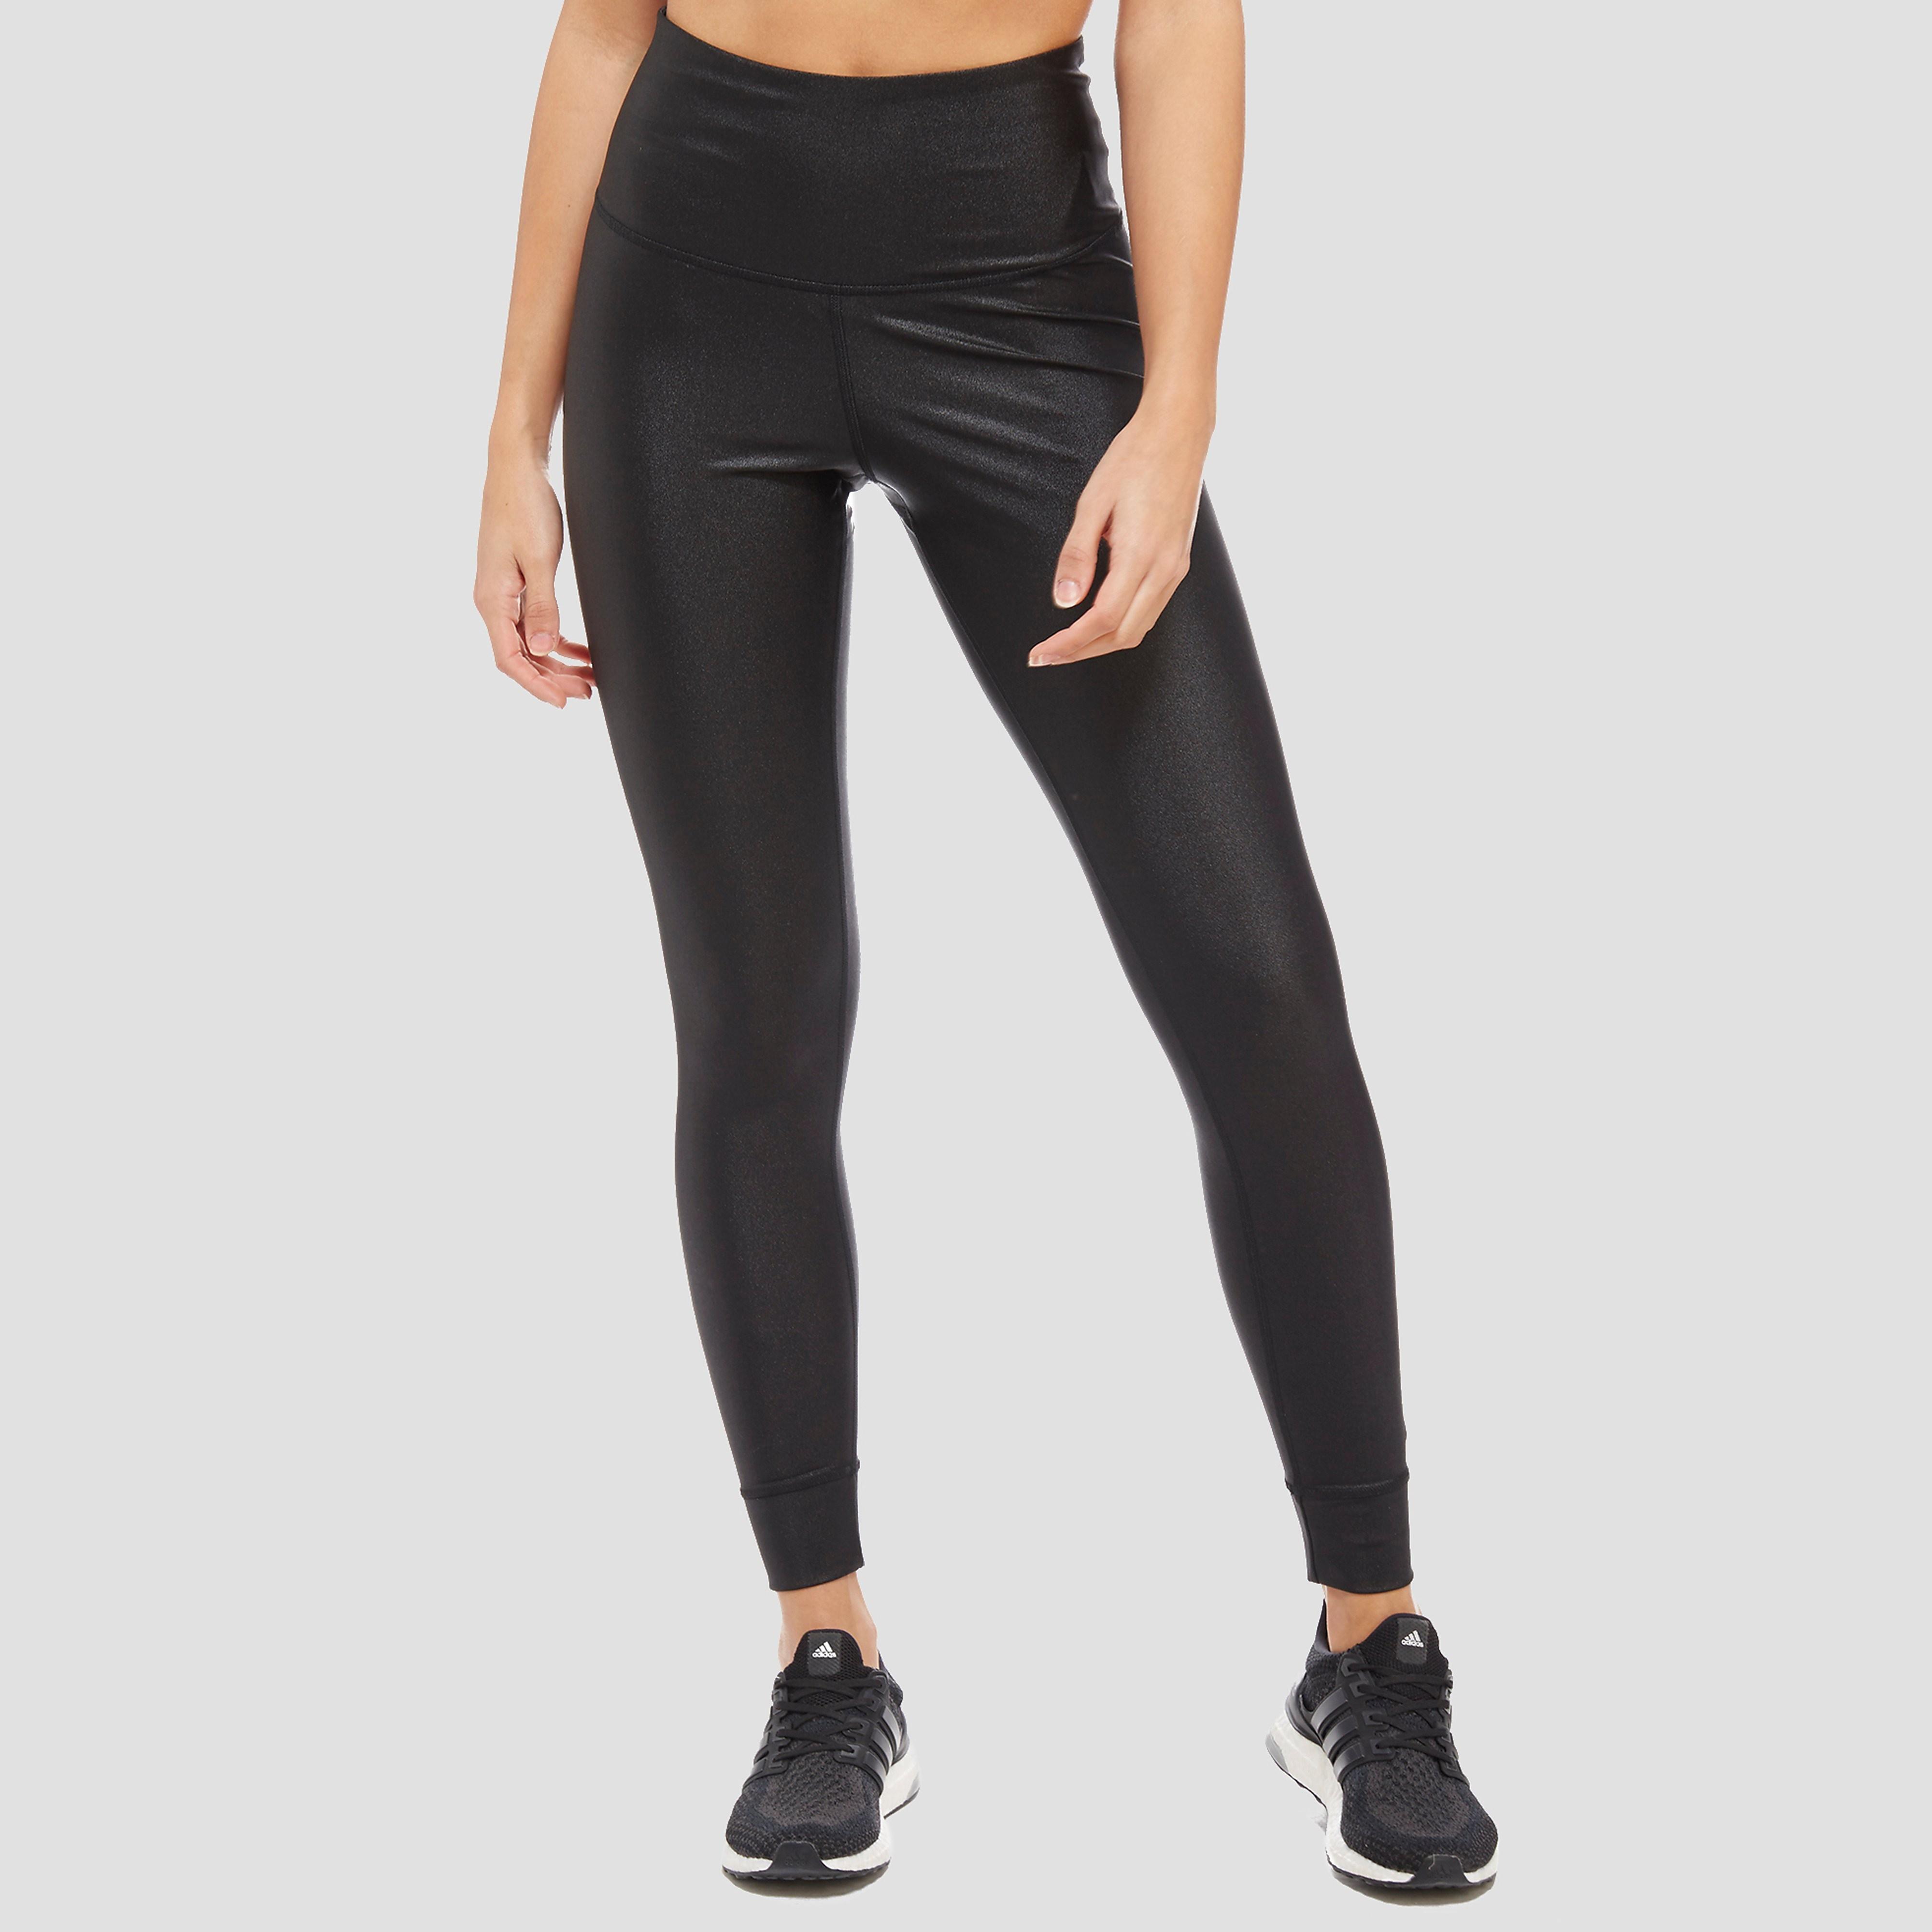 Women's Reebok  METALLIC HIGH RISE LEGGINGS - Black, Black